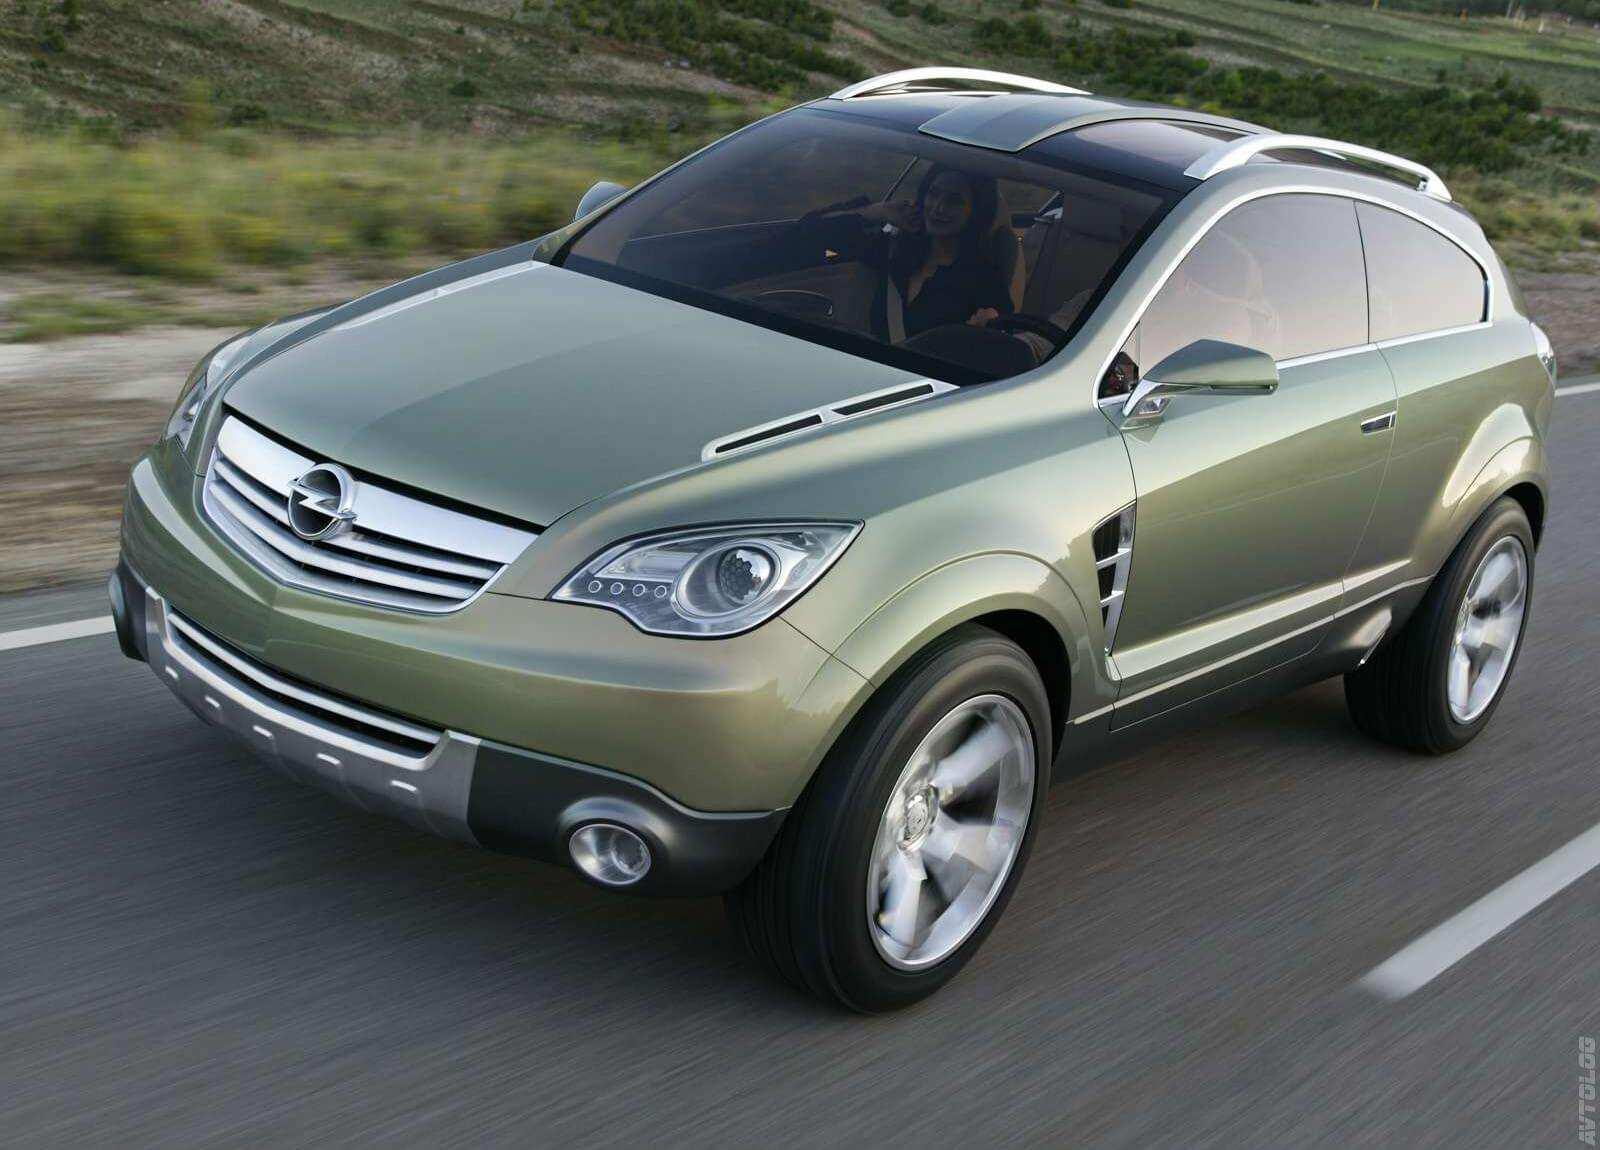 49 Gallery of Opel Antara 2020 History for Opel Antara 2020